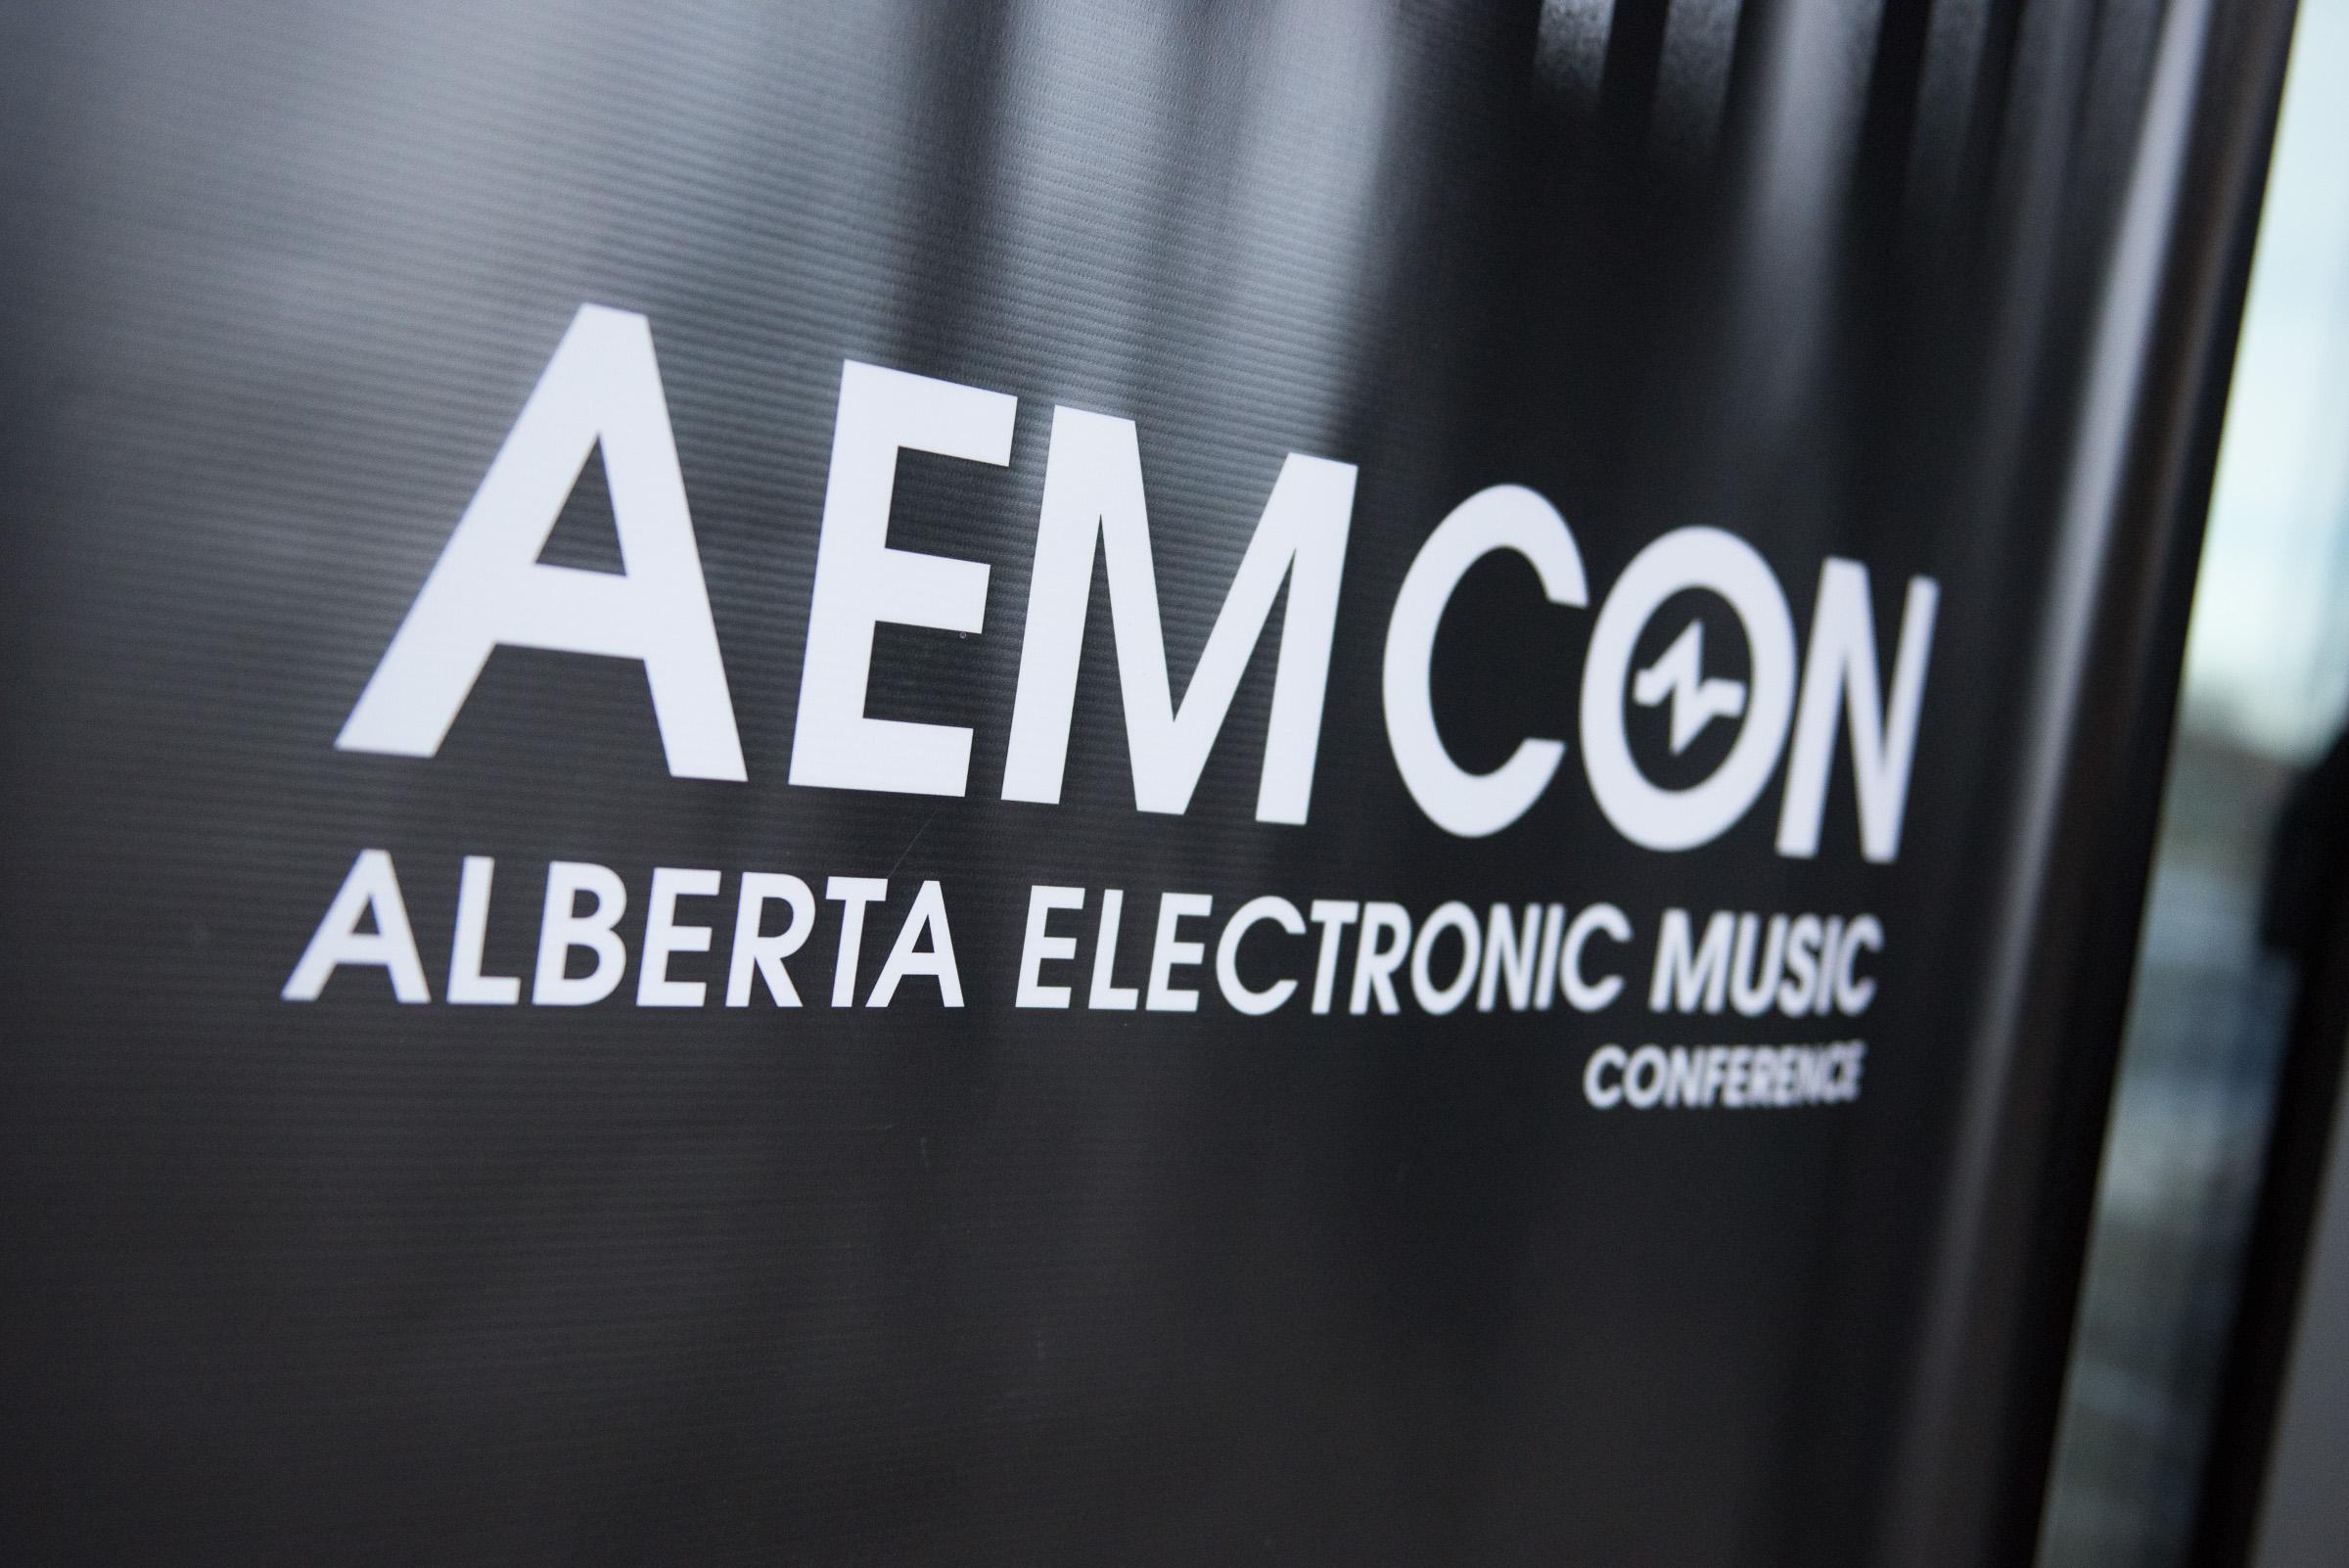 2017 Alberta Electronic Music Conference (AEMCON) in Calgary, Alberta